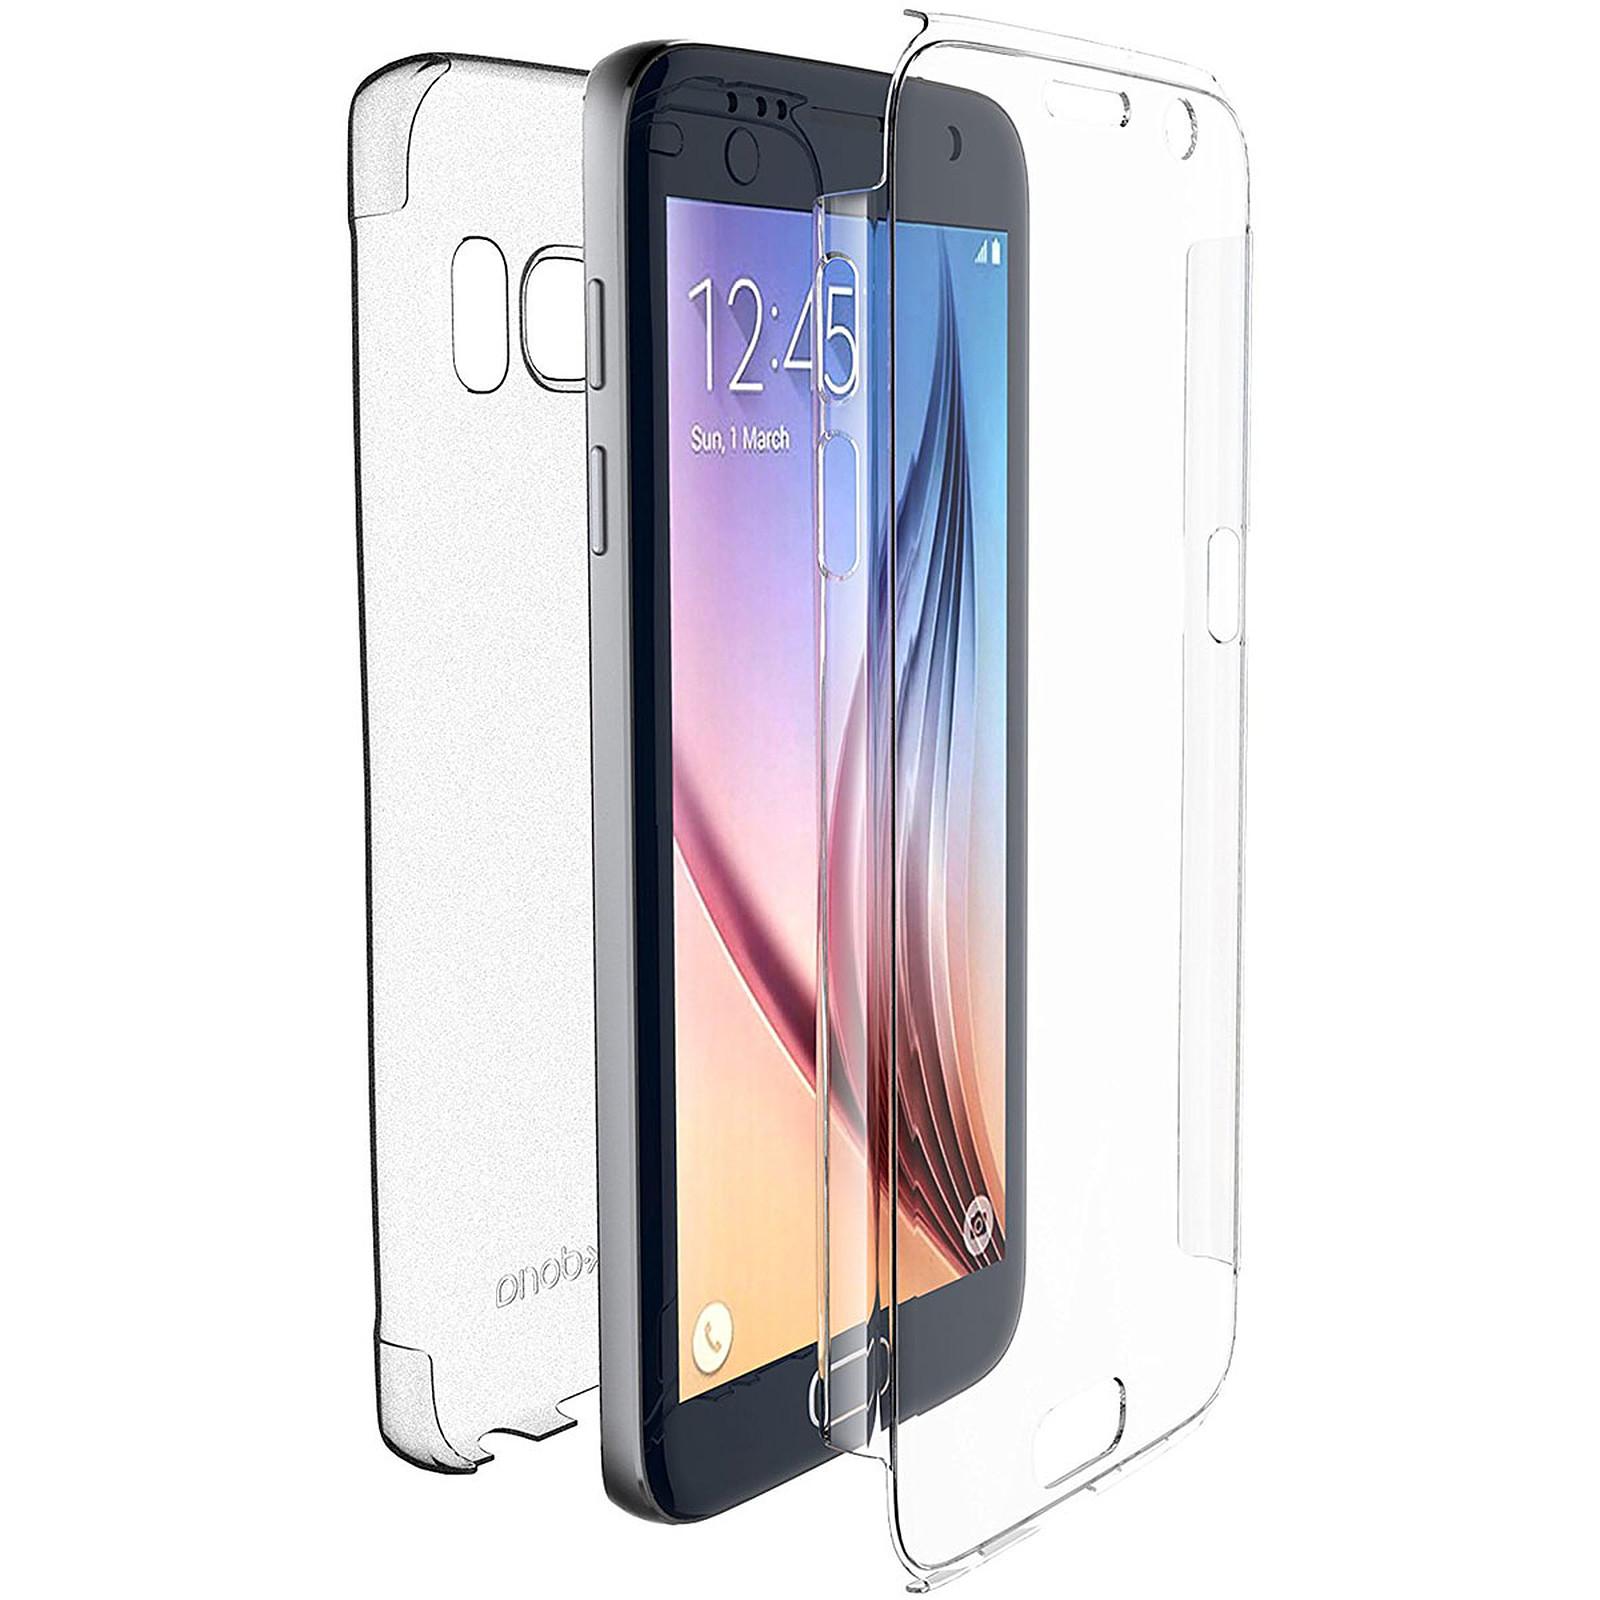 X-Doria Coque de protection defense 360° transparent Samsung Galaxy S7